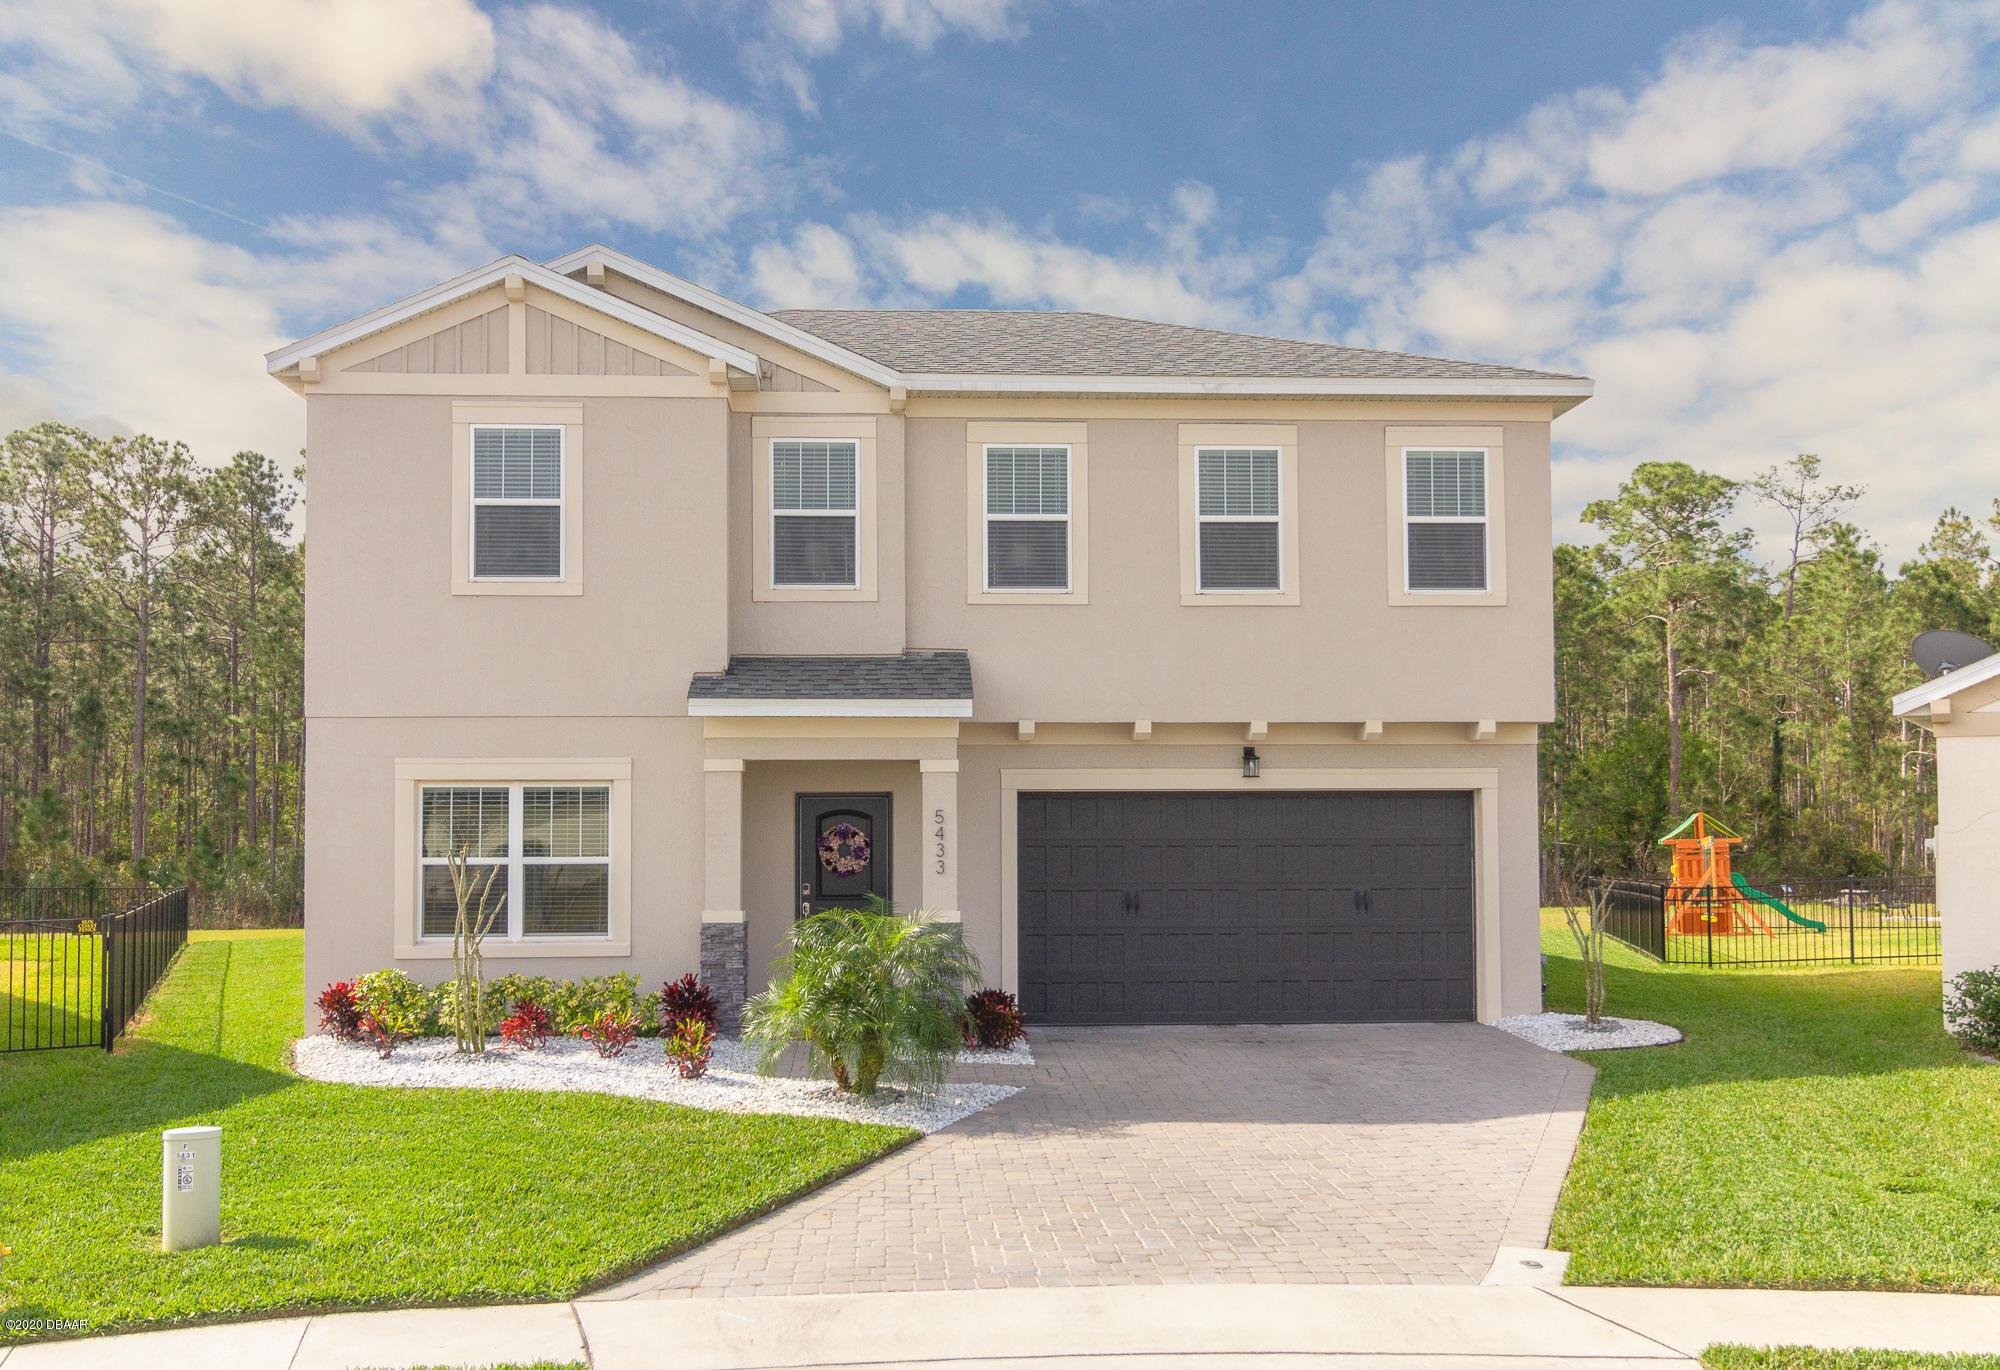 Photo of 5433 Hutchinson Street, Port Orange, FL 32128